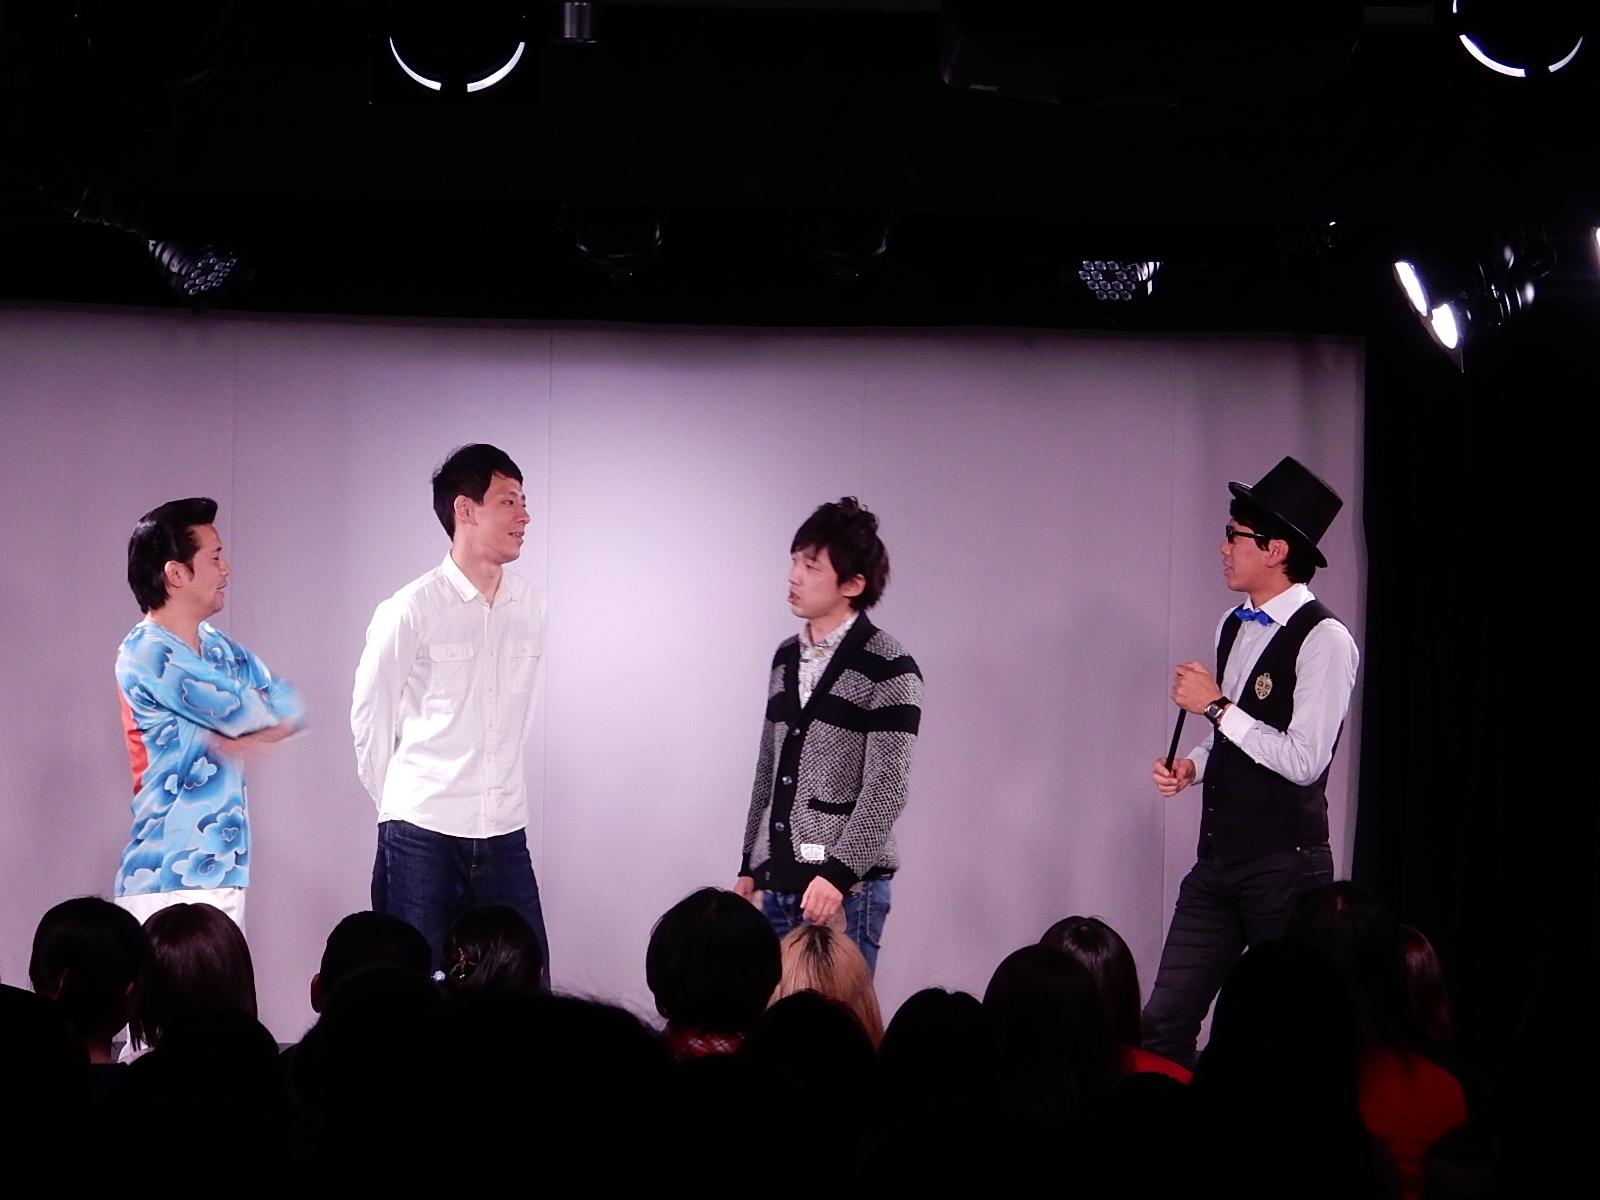 http://news.yoshimoto.co.jp/photos/uncategorized/2014/12/30/20141230150145-73a81a027fae5209fc7085f3ebe6ae29546015cb.jpg